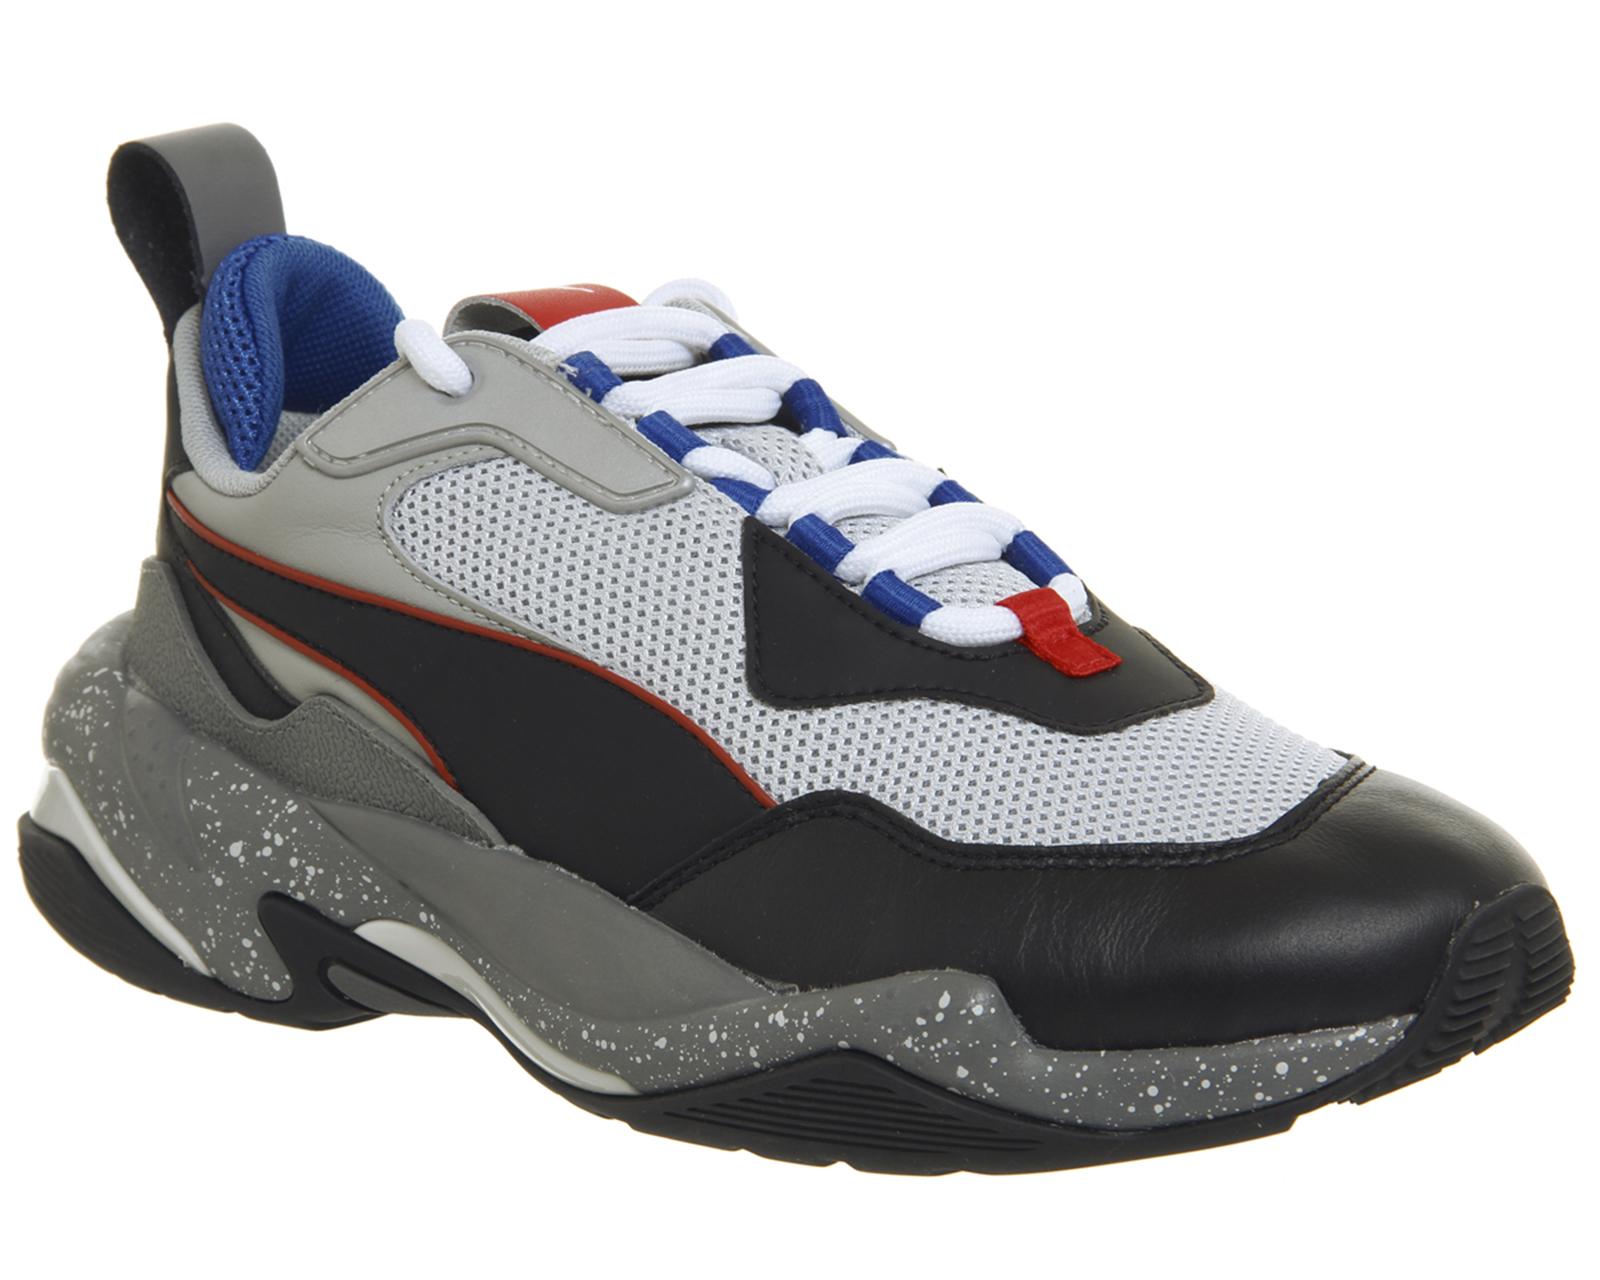 884f67d1c14c9b Sentinel Womens Puma Thunder Electric Trainers Grey Violet Puma Black  Trainers Shoes